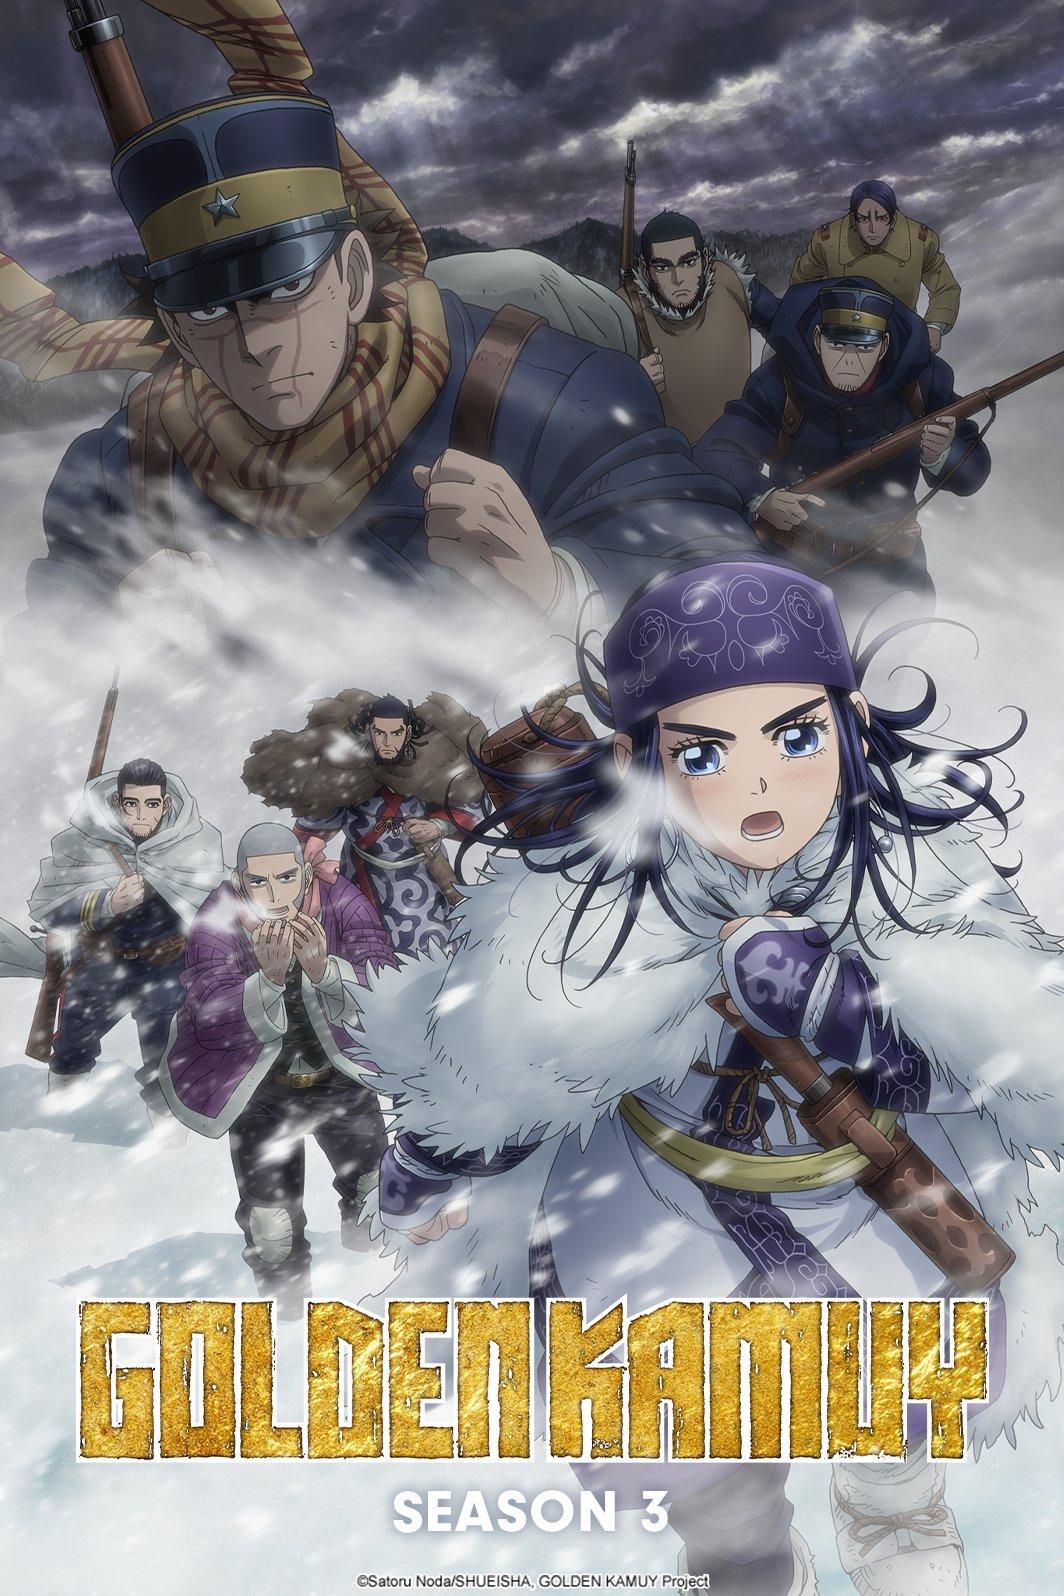 Golden Kamui S3 Crunchyroll